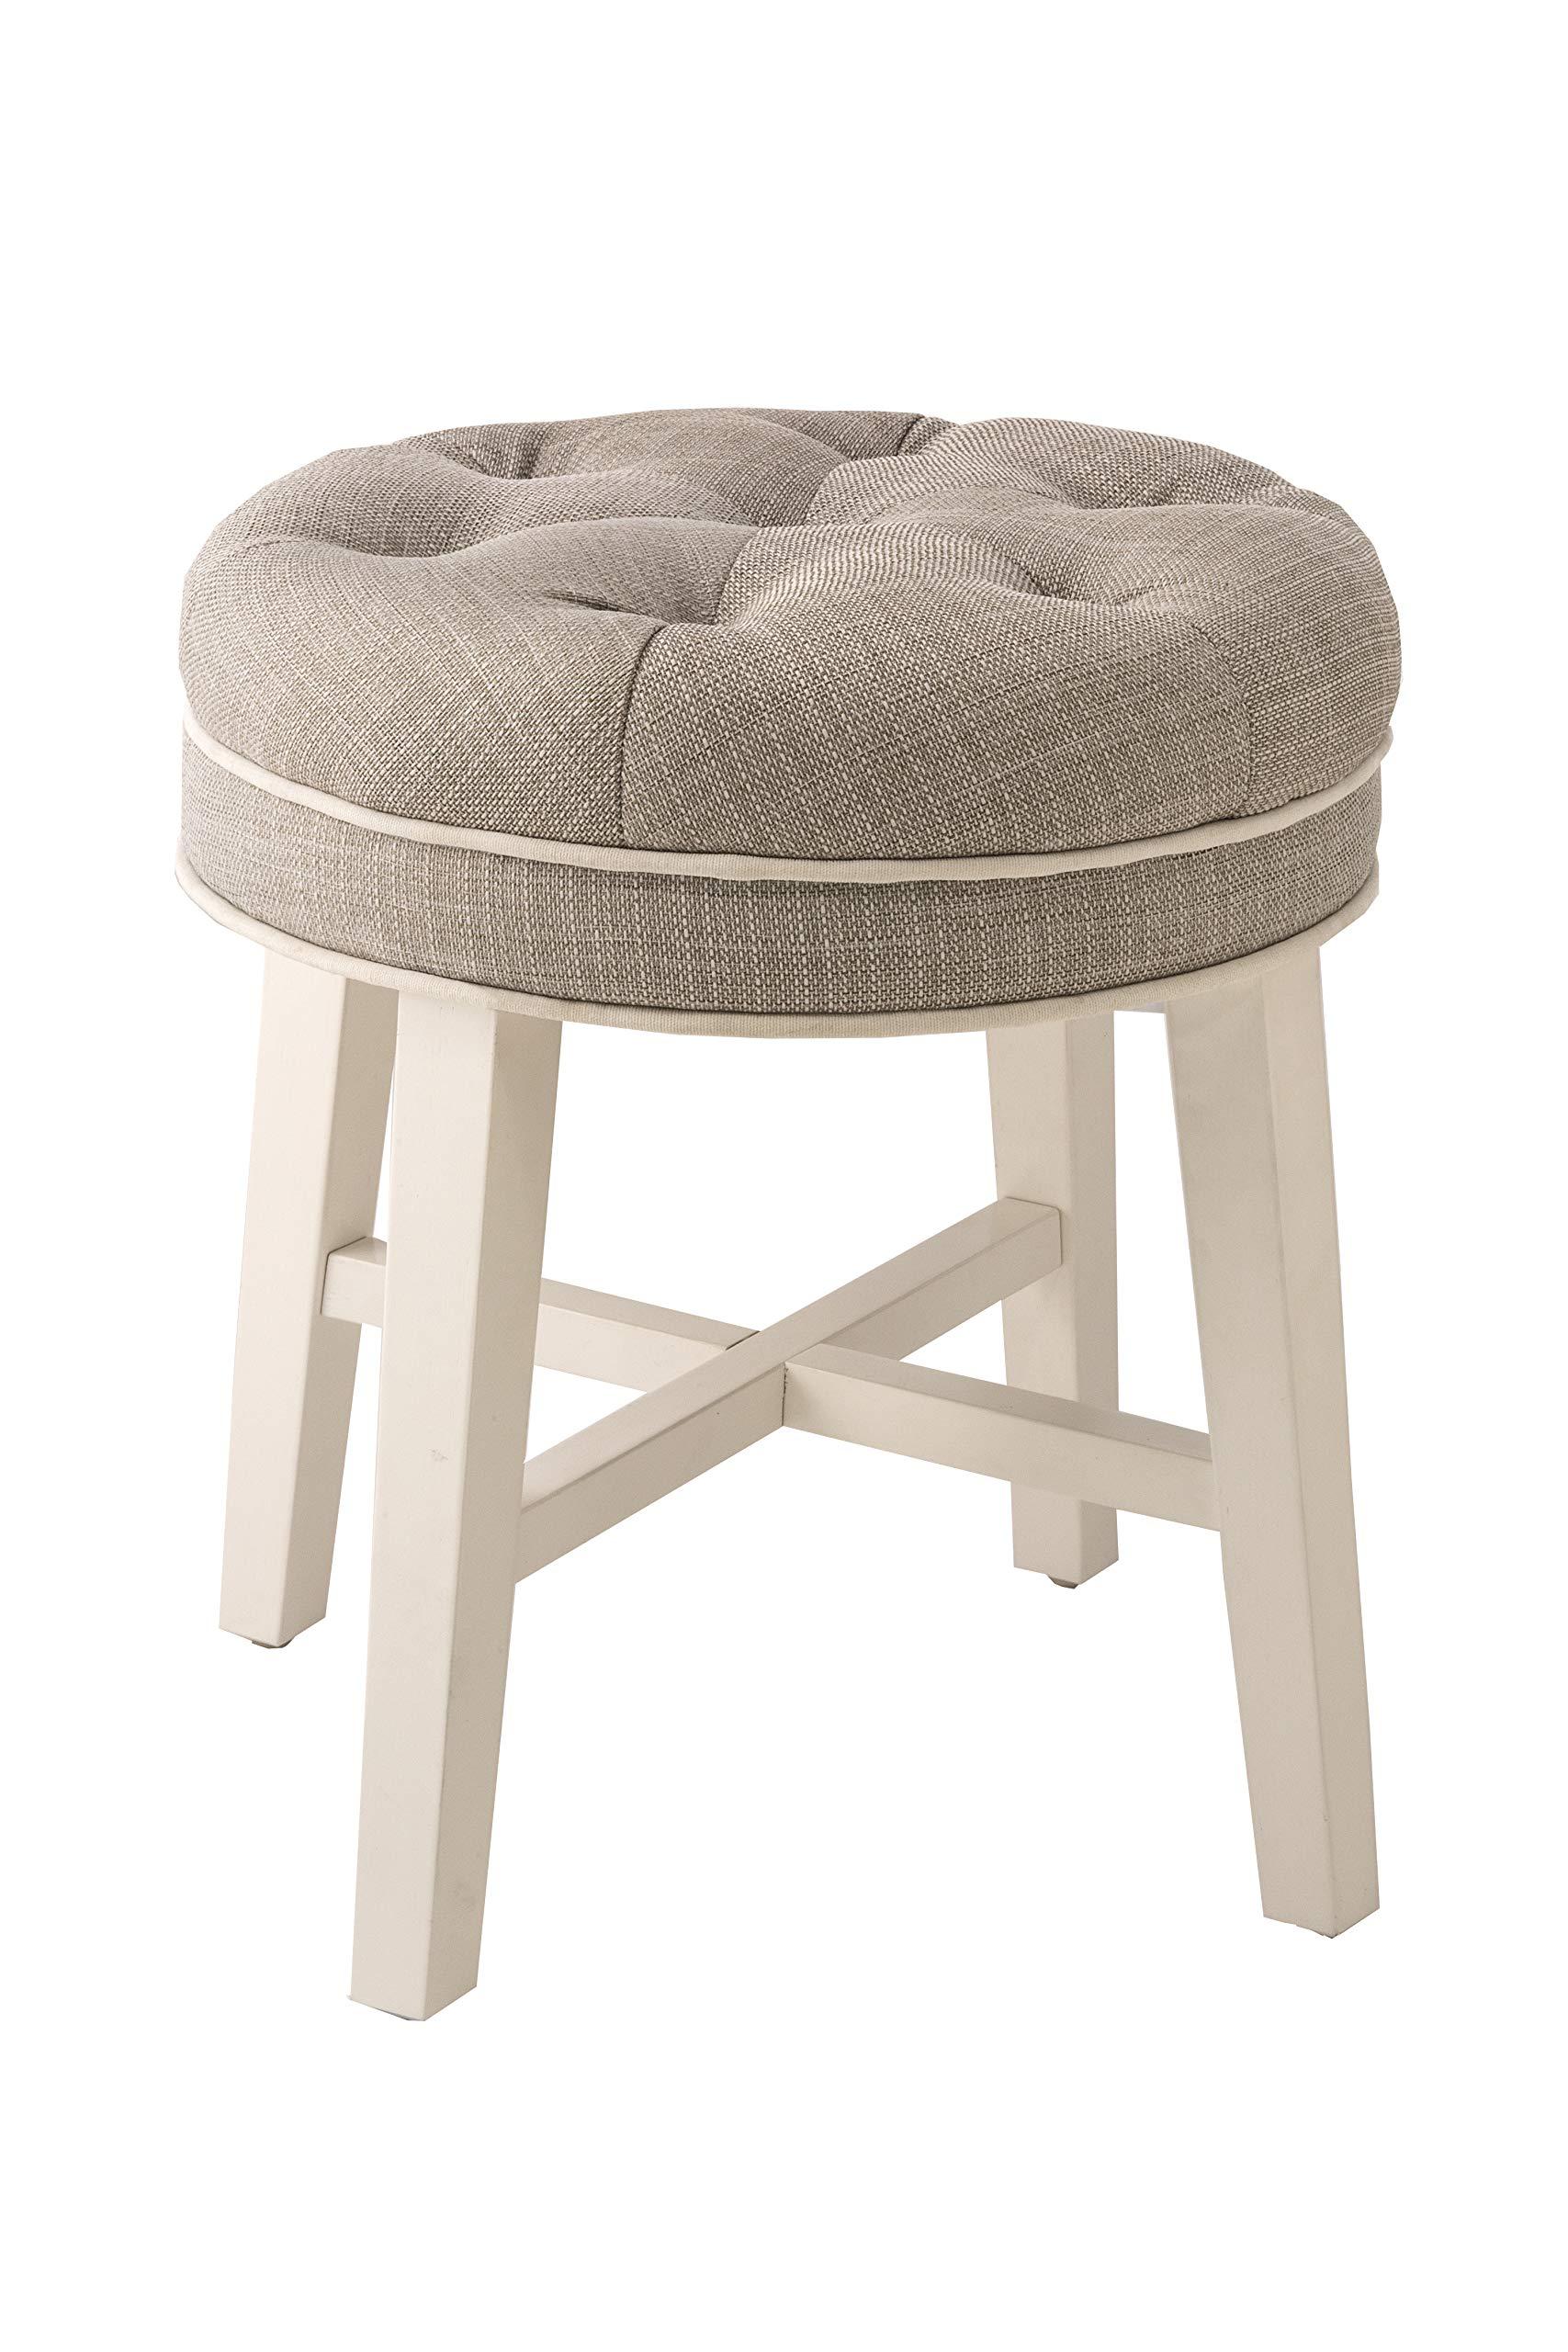 Hillsdale Furniture 51007 Sophia Vanity Stool, Linen Gray